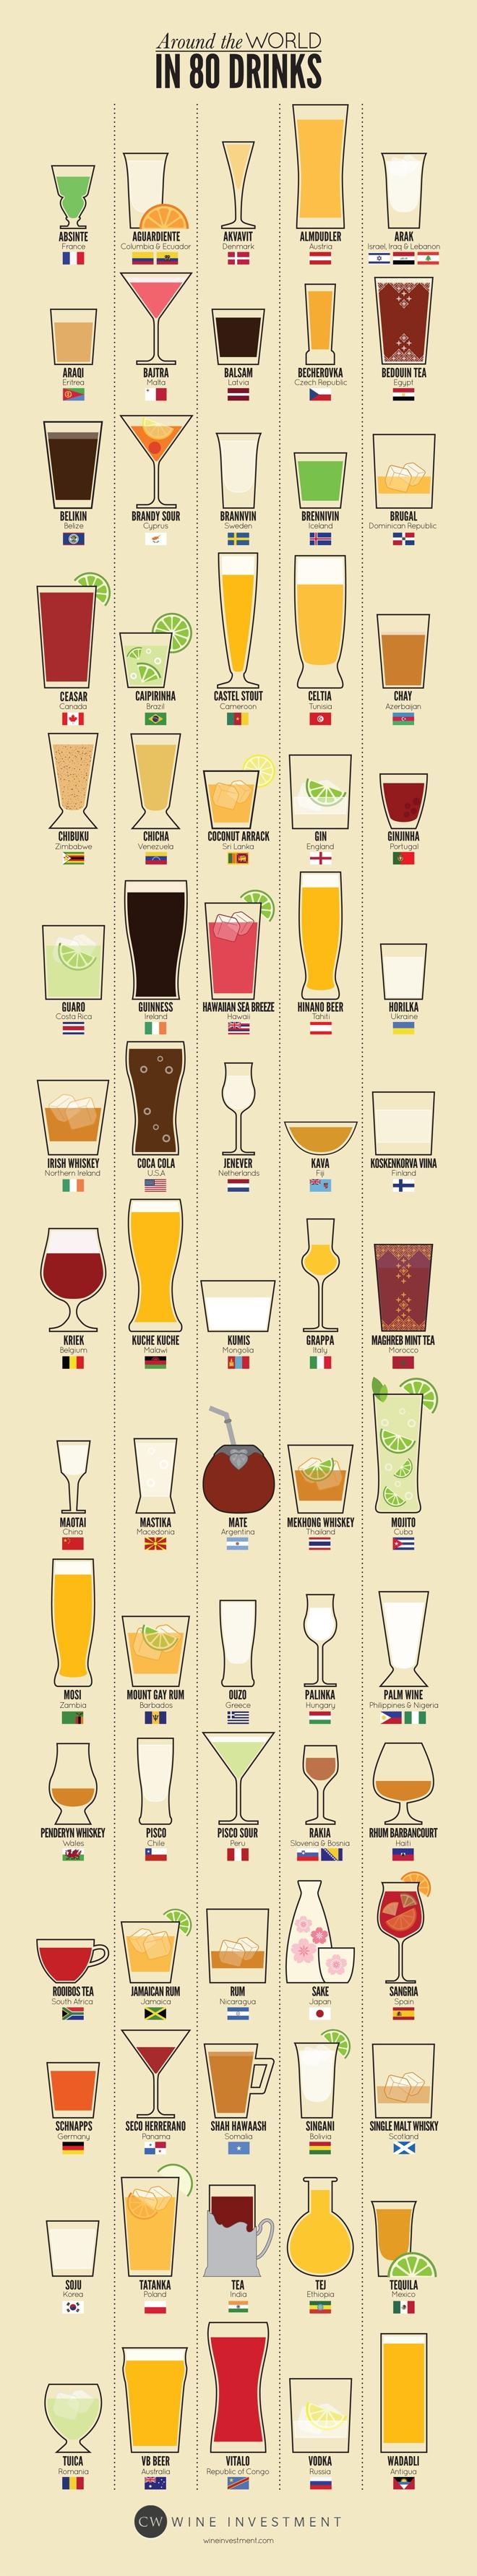 bebidas alrededor del mundo paises